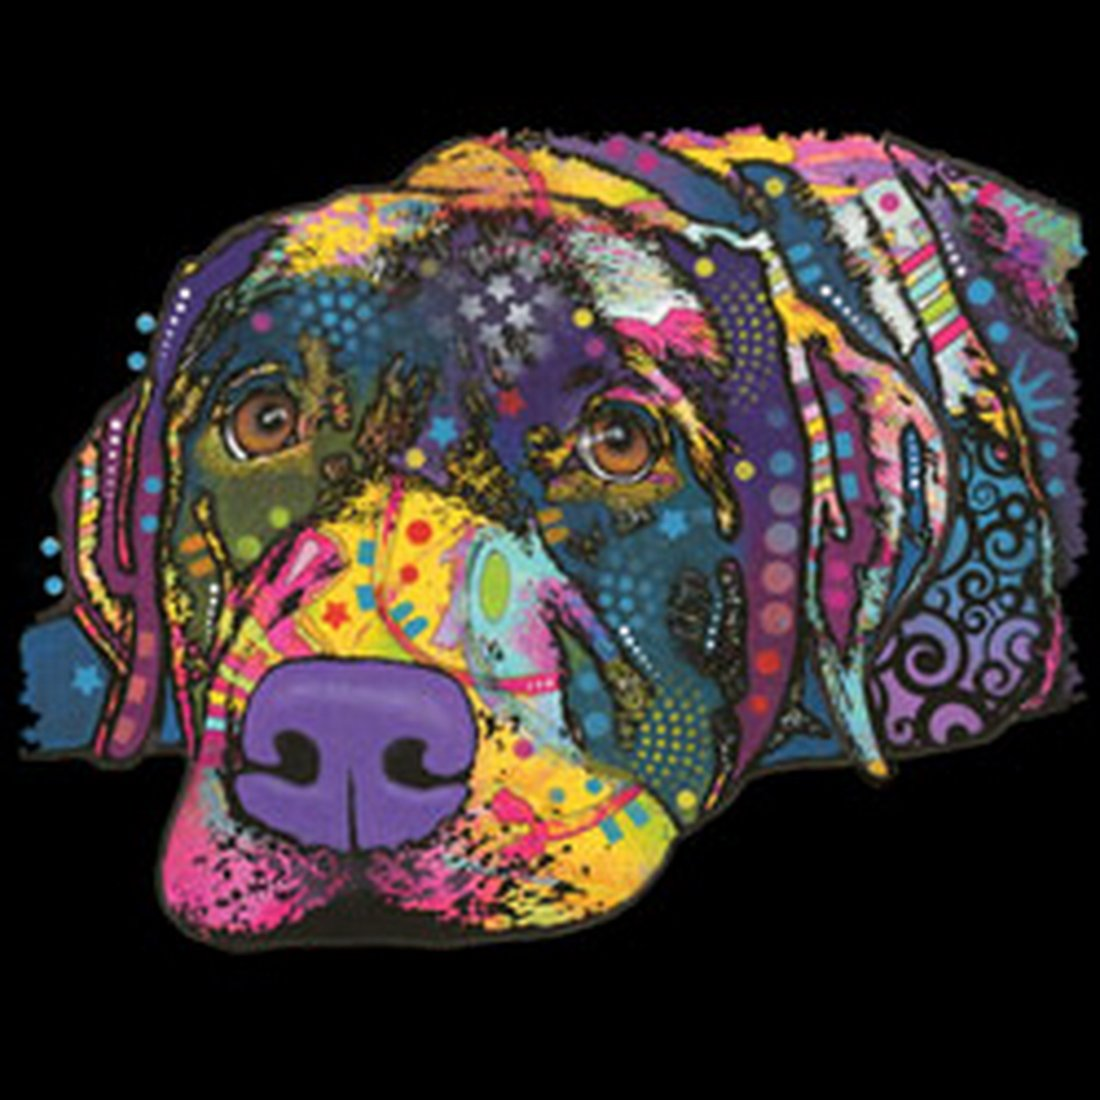 Hund Savvy Savvy Savvy Labrador Sweater Pulli Pullover Hunde Dog Geschenk für Hundehalter Geschenk für Hundebesitzer Weihnachtsgeschenk B01M18QUYX Kapuzenpullover Echt 259e71